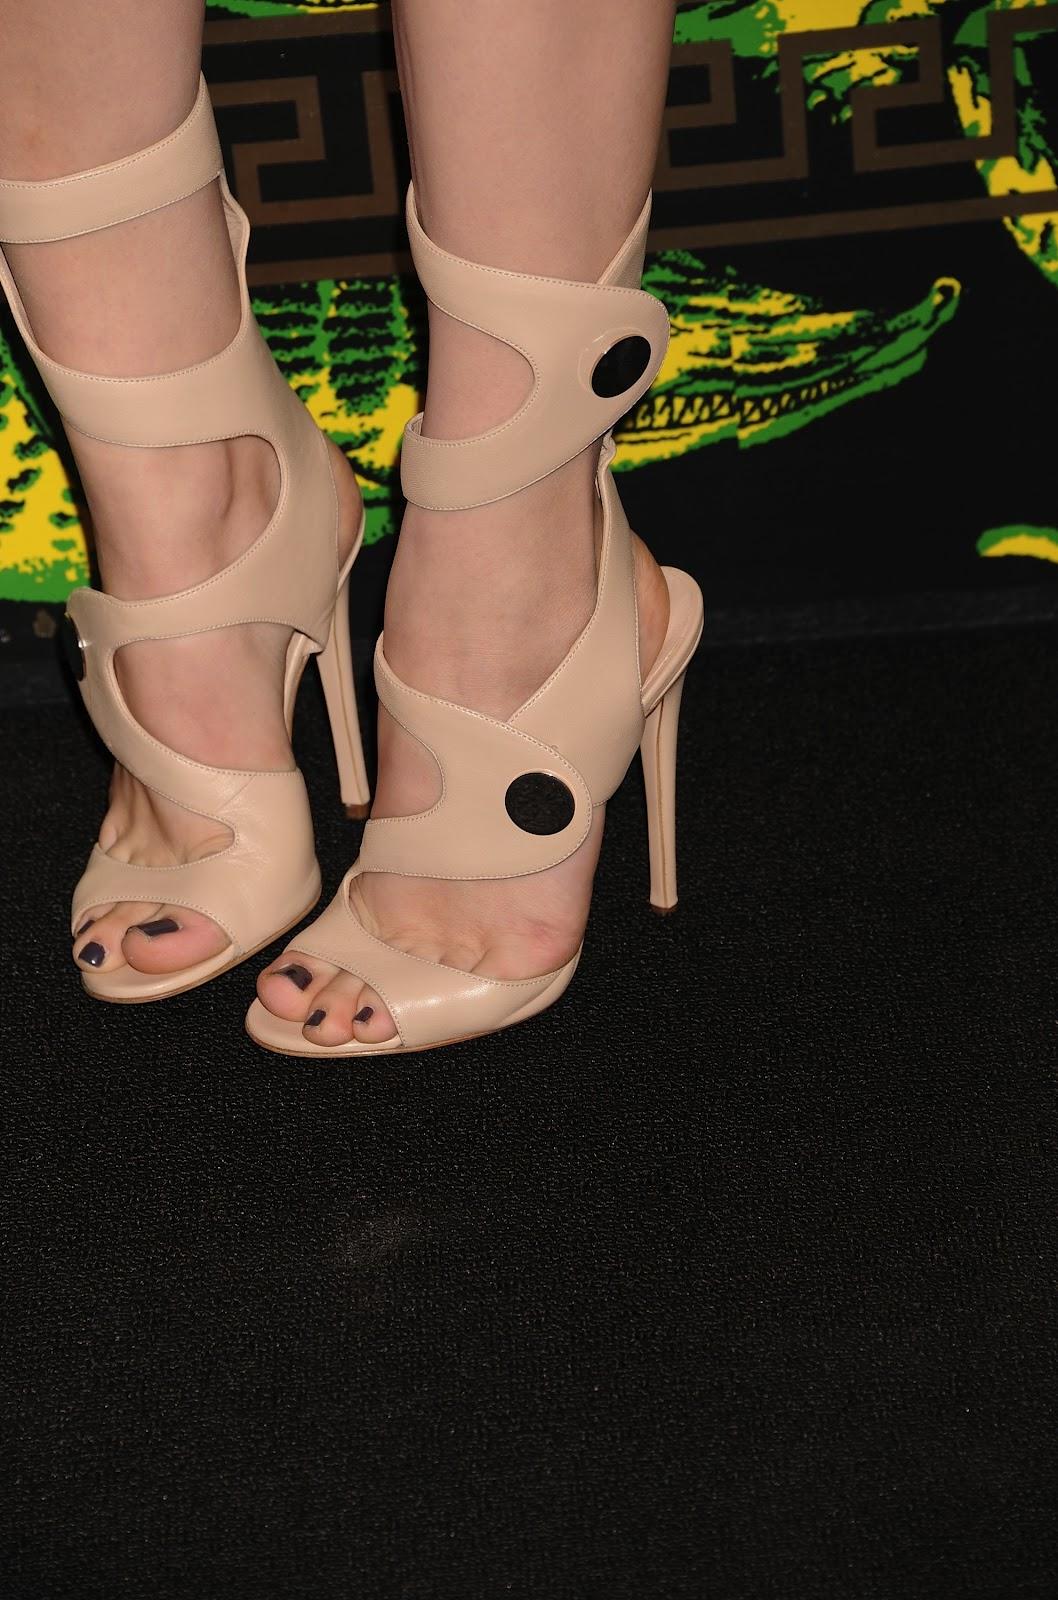 foot fetish photos Chloe